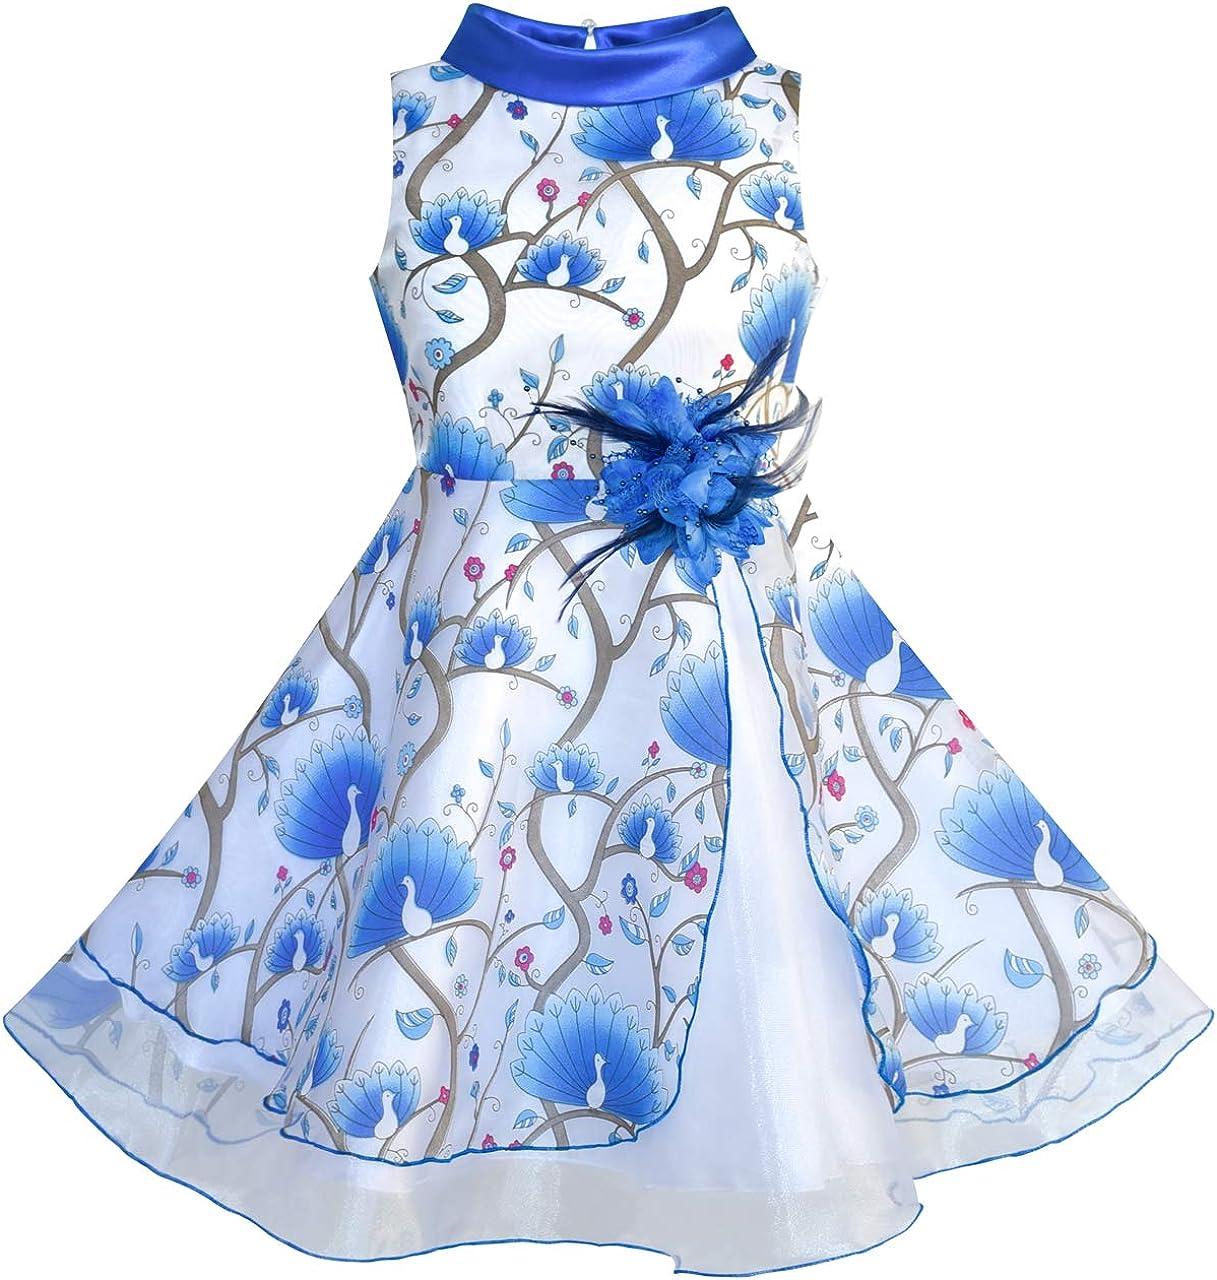 Sunny Fashion Flower Girls Dress Blue Peacock Wedding Bridesmaid Size 6-12